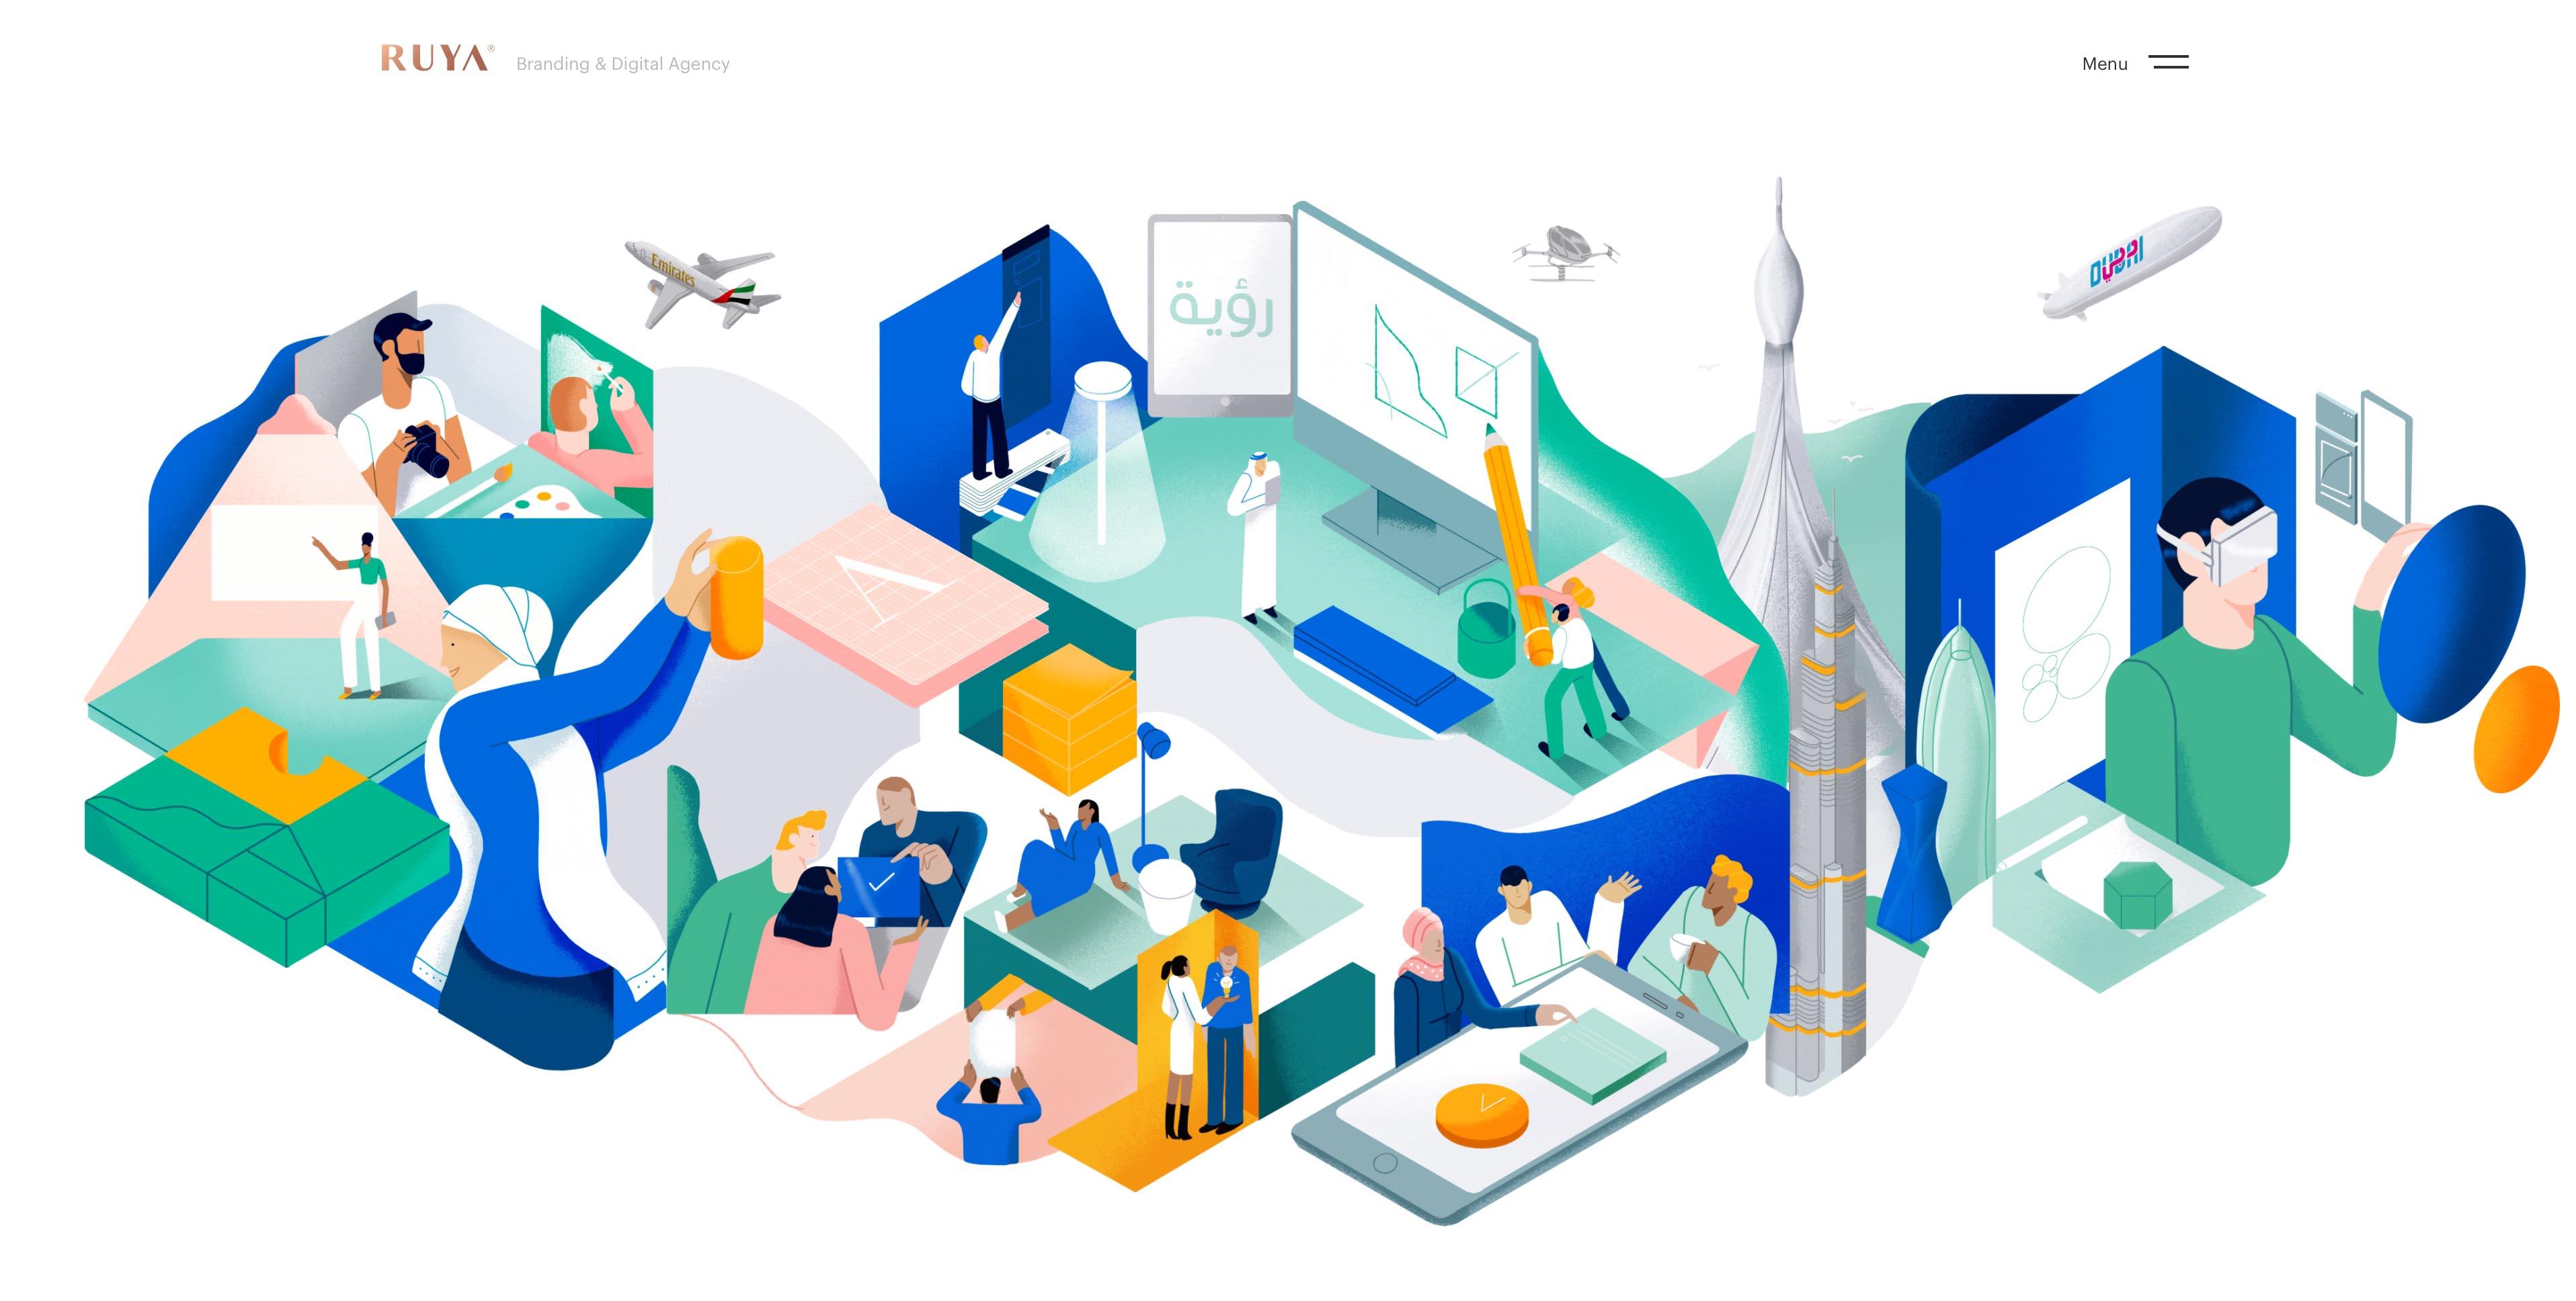 Web Design and Illustration Image